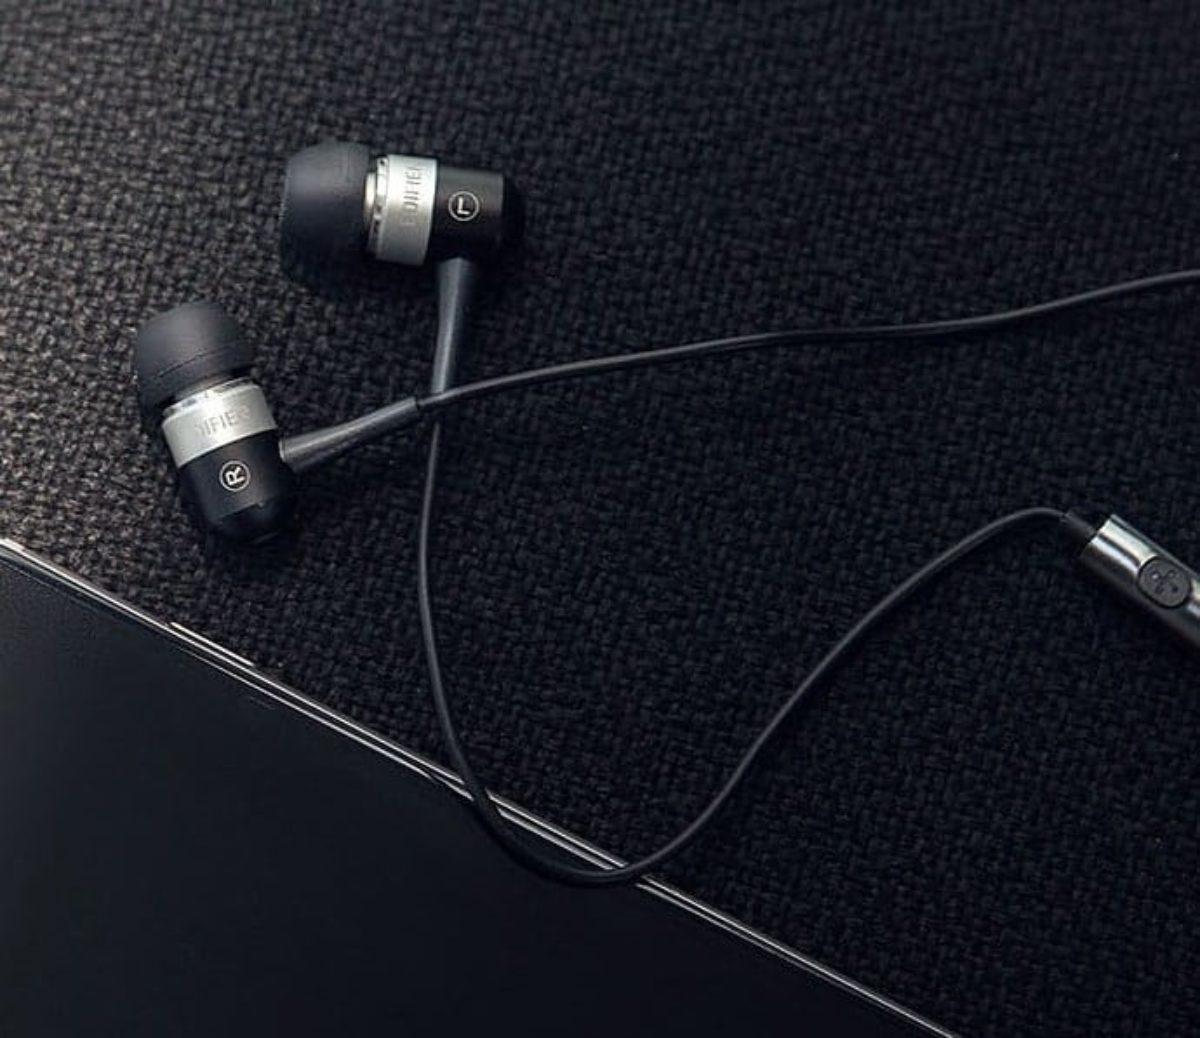 Best Gaming Earbuds 2020 Buying Guide Gamingscan